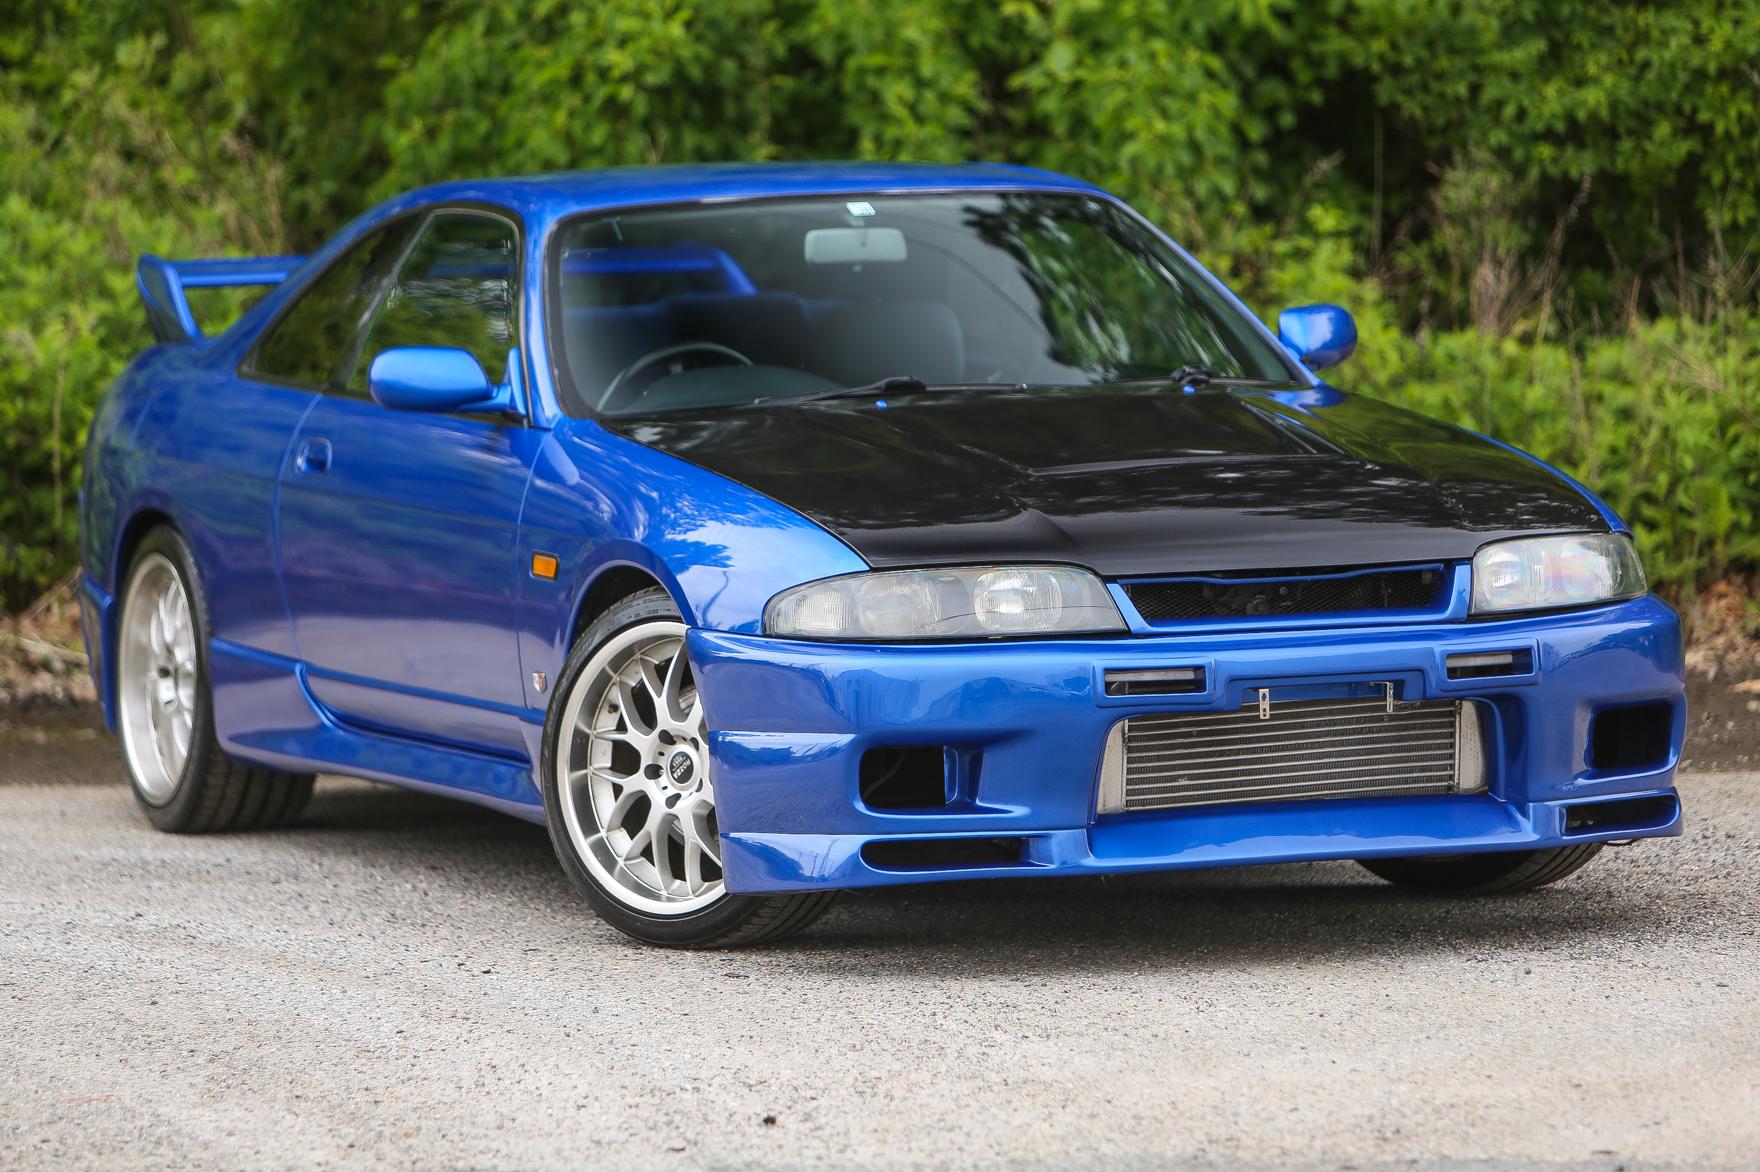 1995 Nissan Skyline R33 GTS-T - Asking Price $33,500